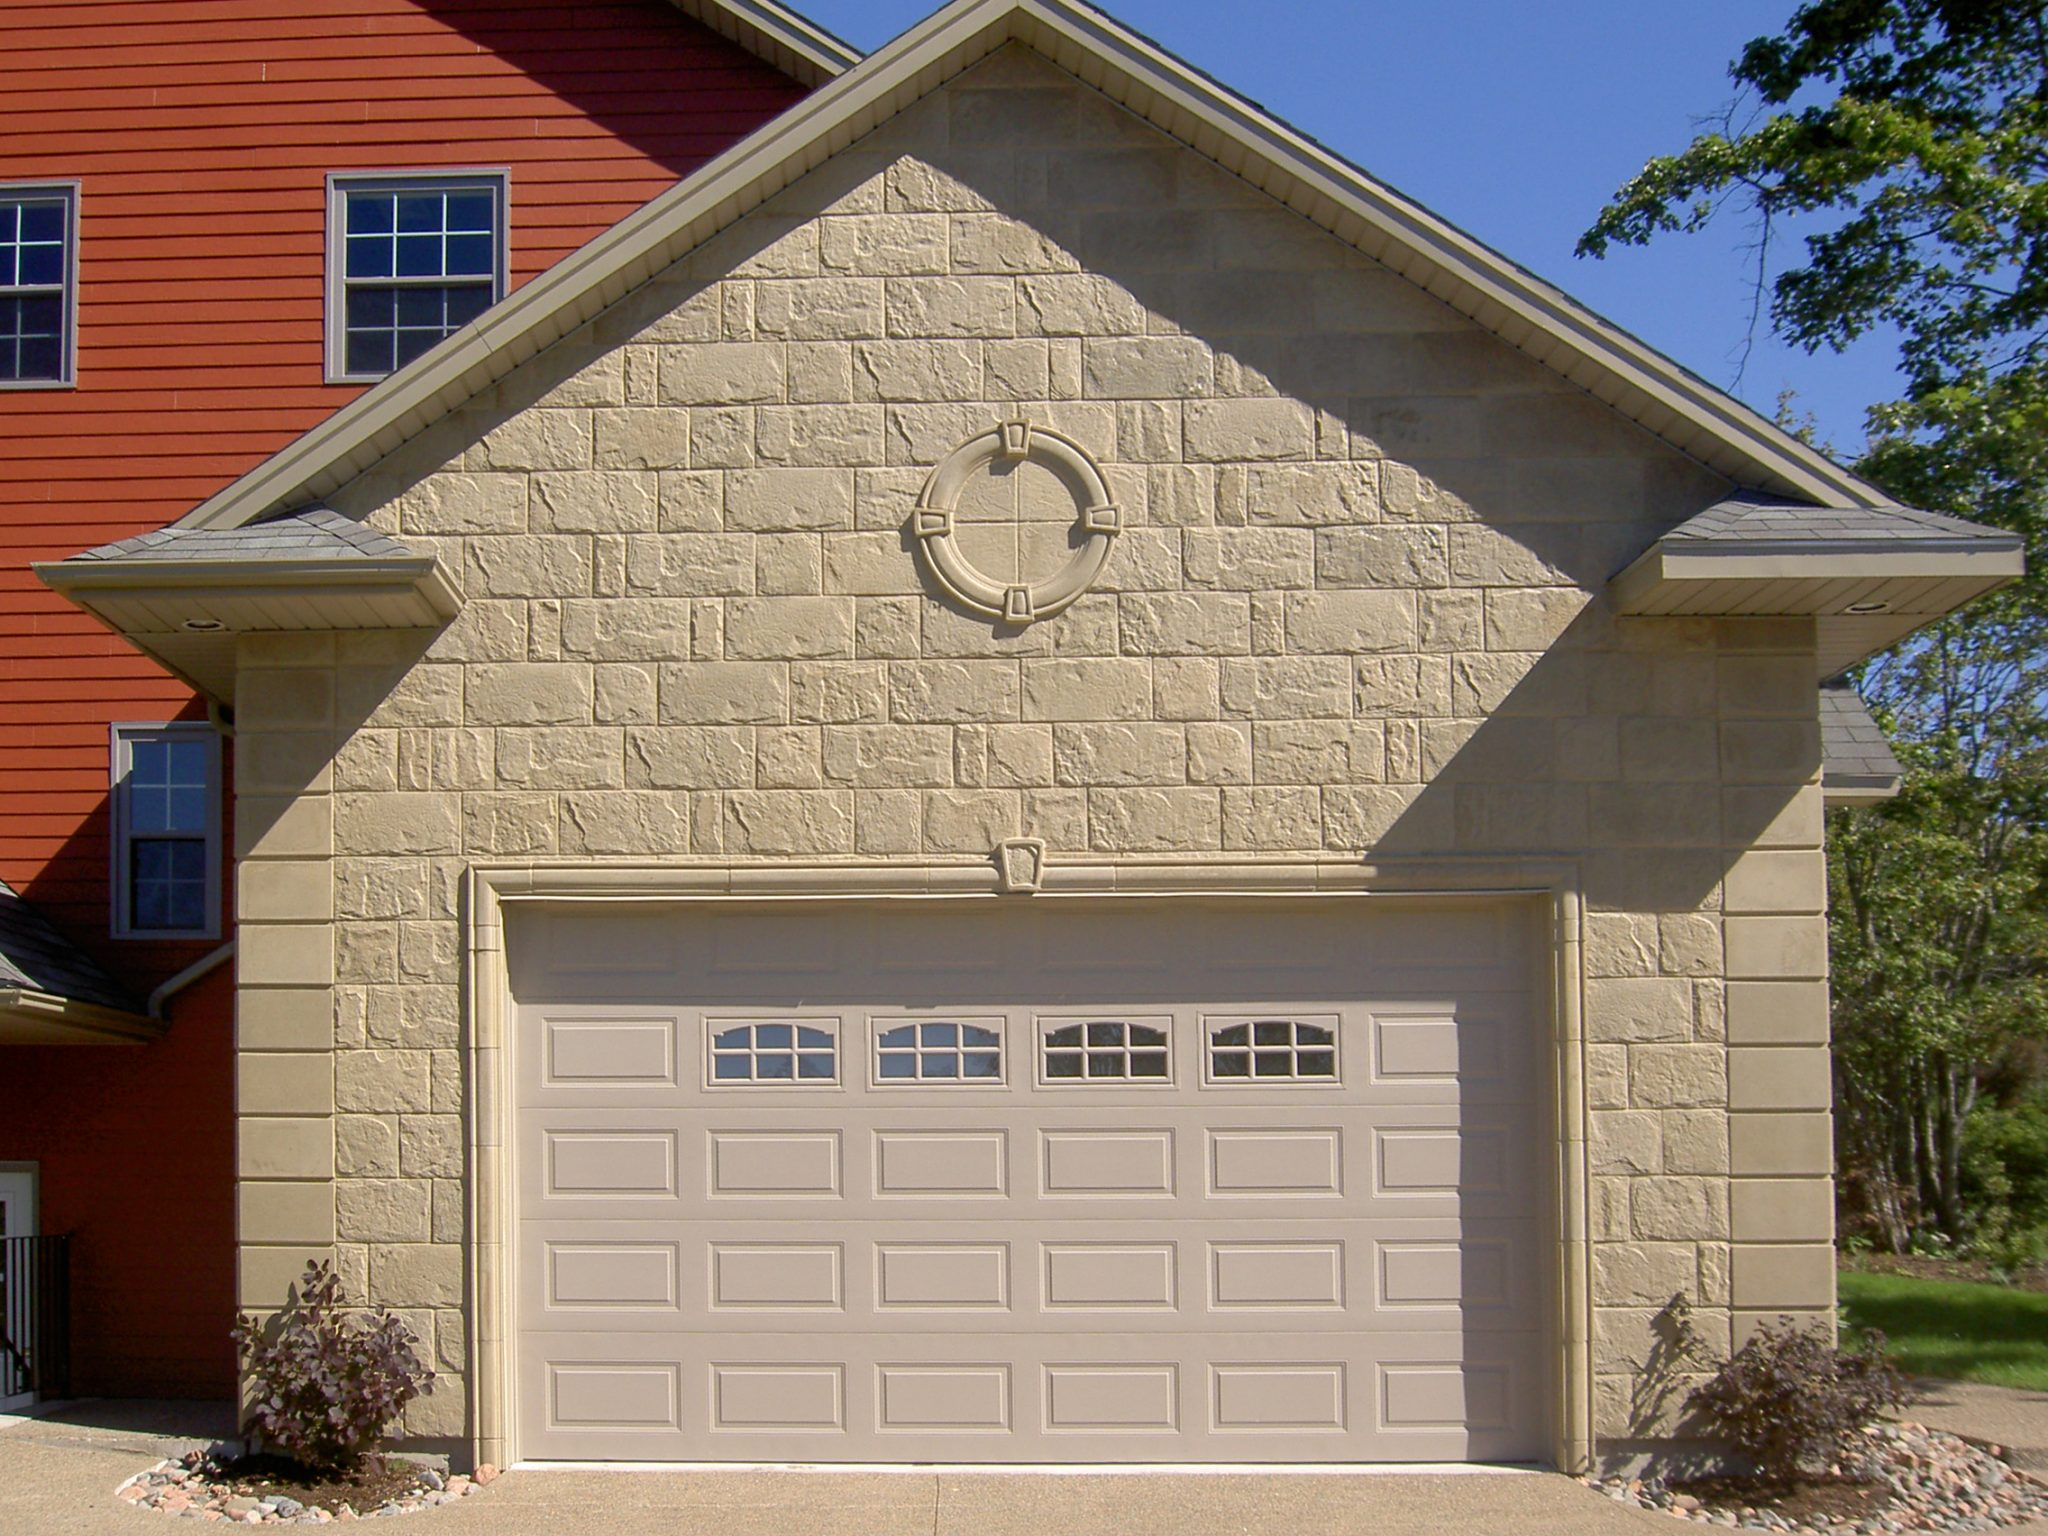 Heritage Tiles - Stonetile Canada